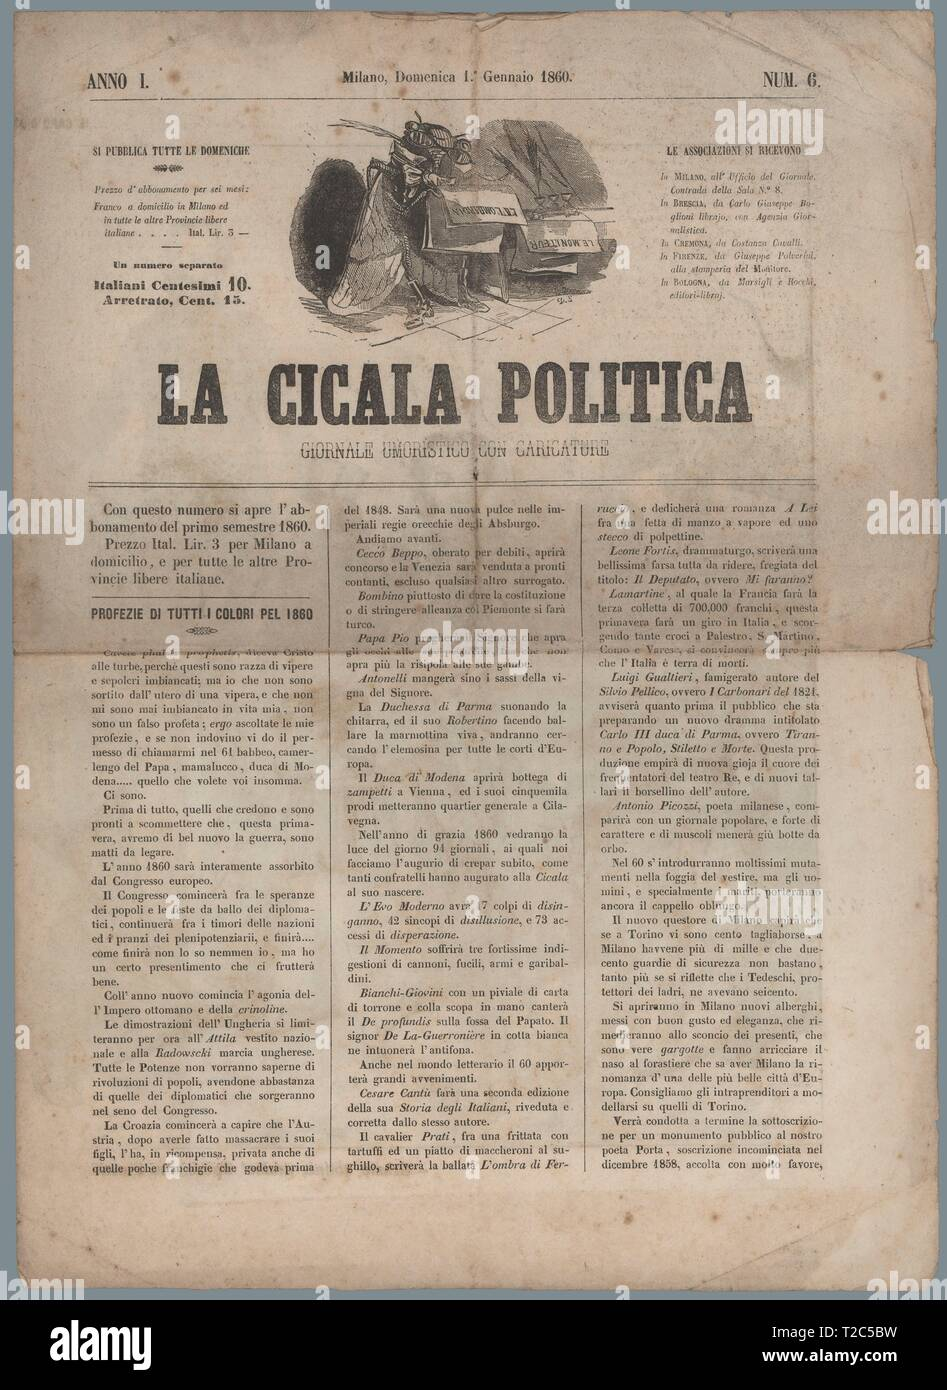 Cartina Politica Italia 1860.Politica Italiana High Resolution Stock Photography And Images Alamy